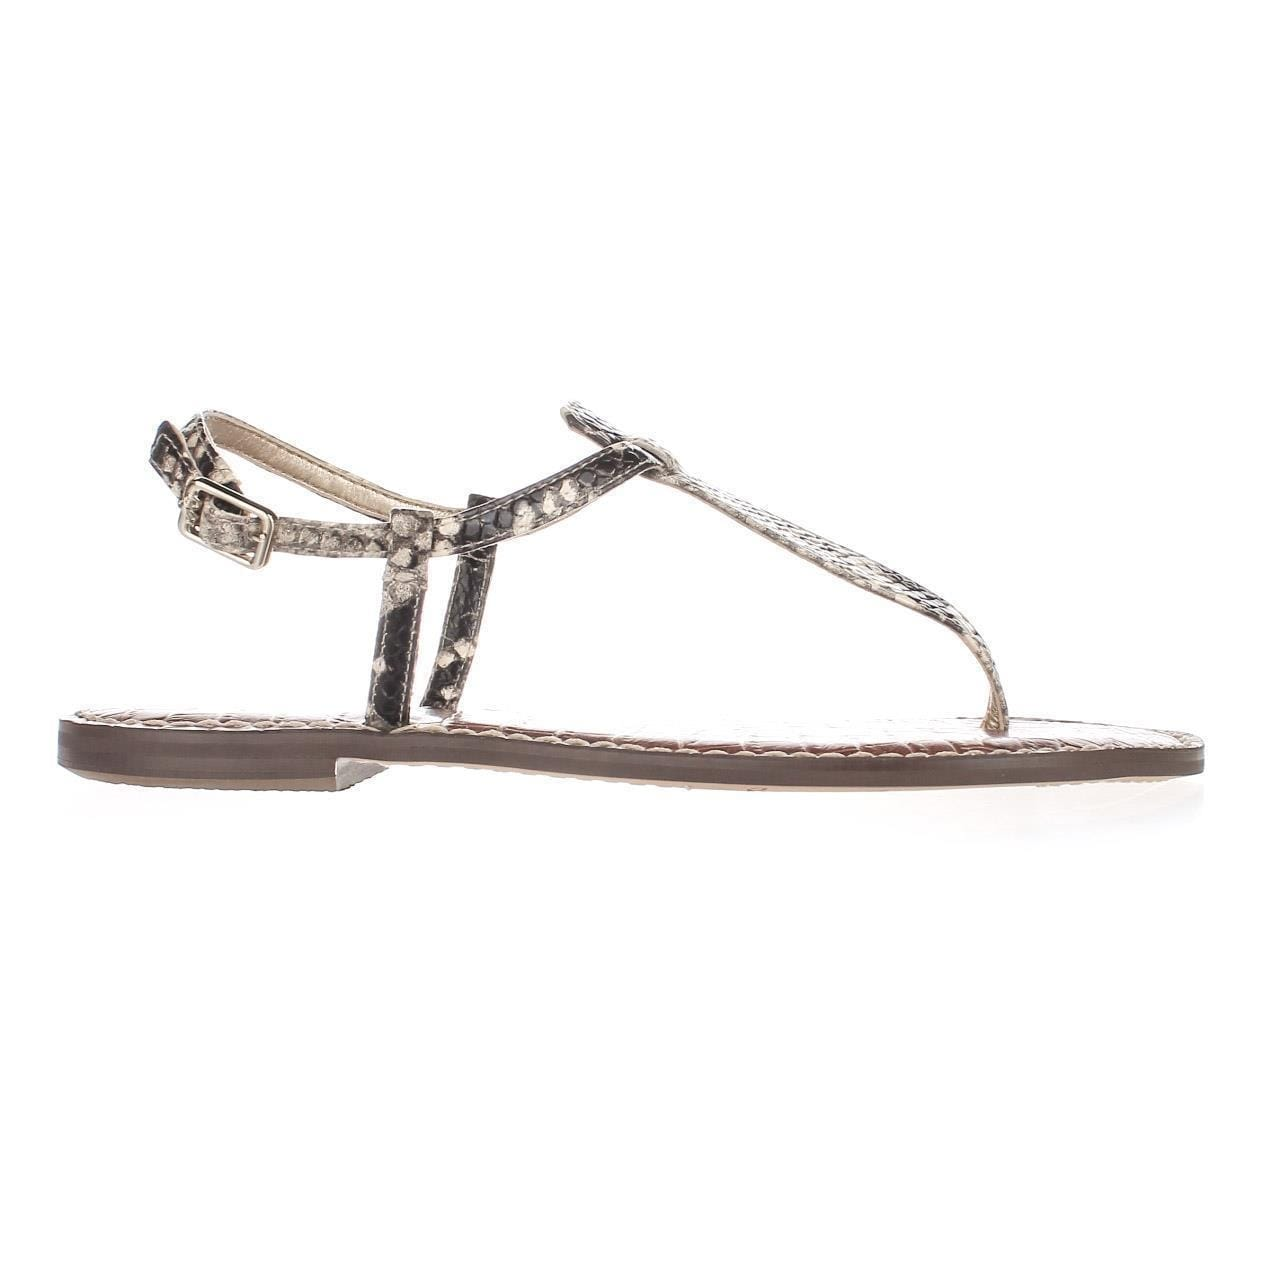 ad979772e004 Shop Sam Edelman Gigi Flat Sandals